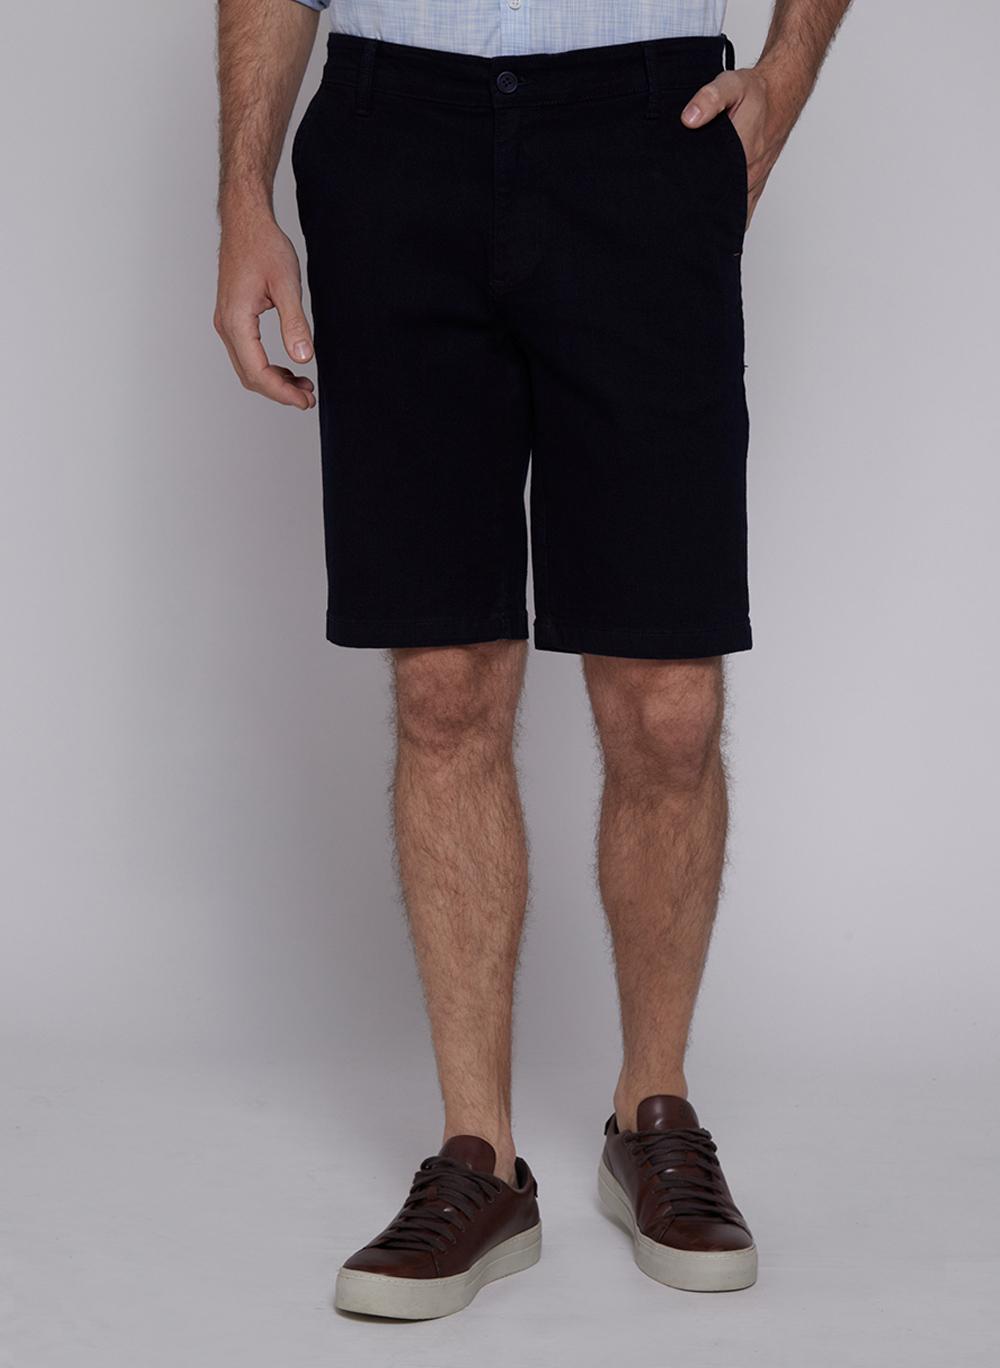 Bermuda Masculina Jeans Right Fit Bolso faca Individual